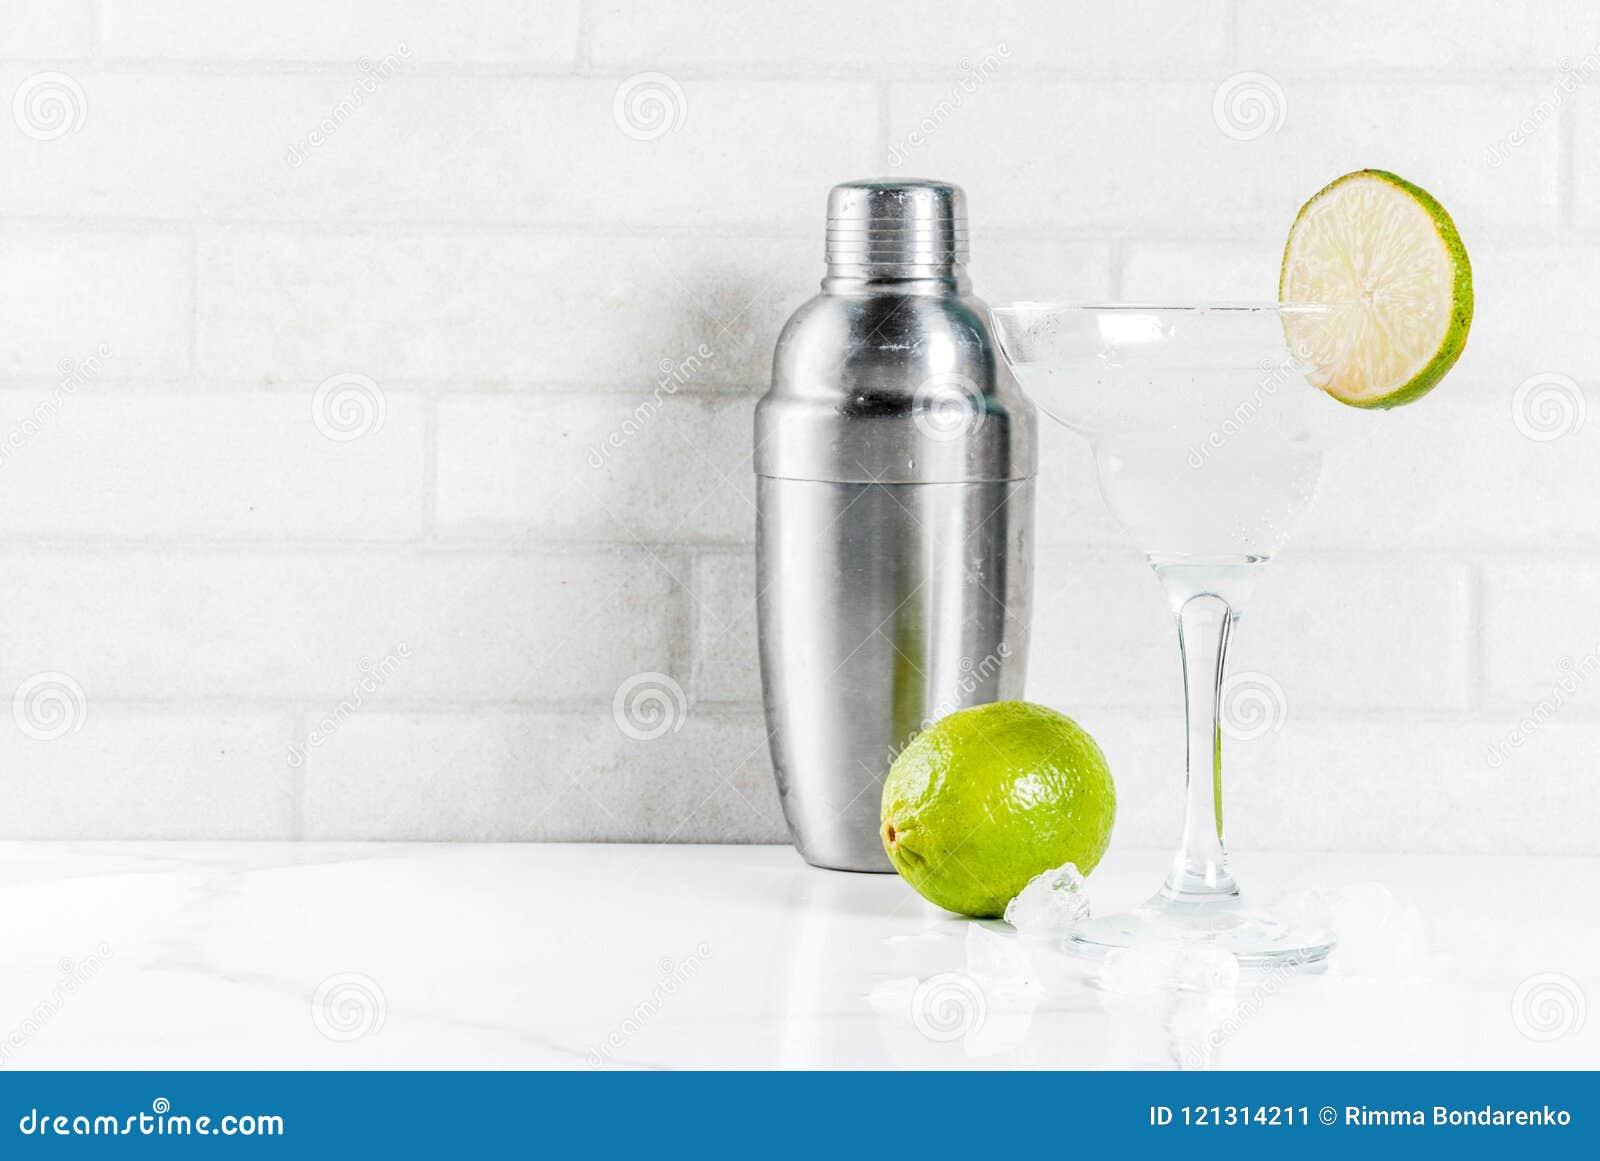 Homemade summer refreshment drink, lime and lemon margarita coc